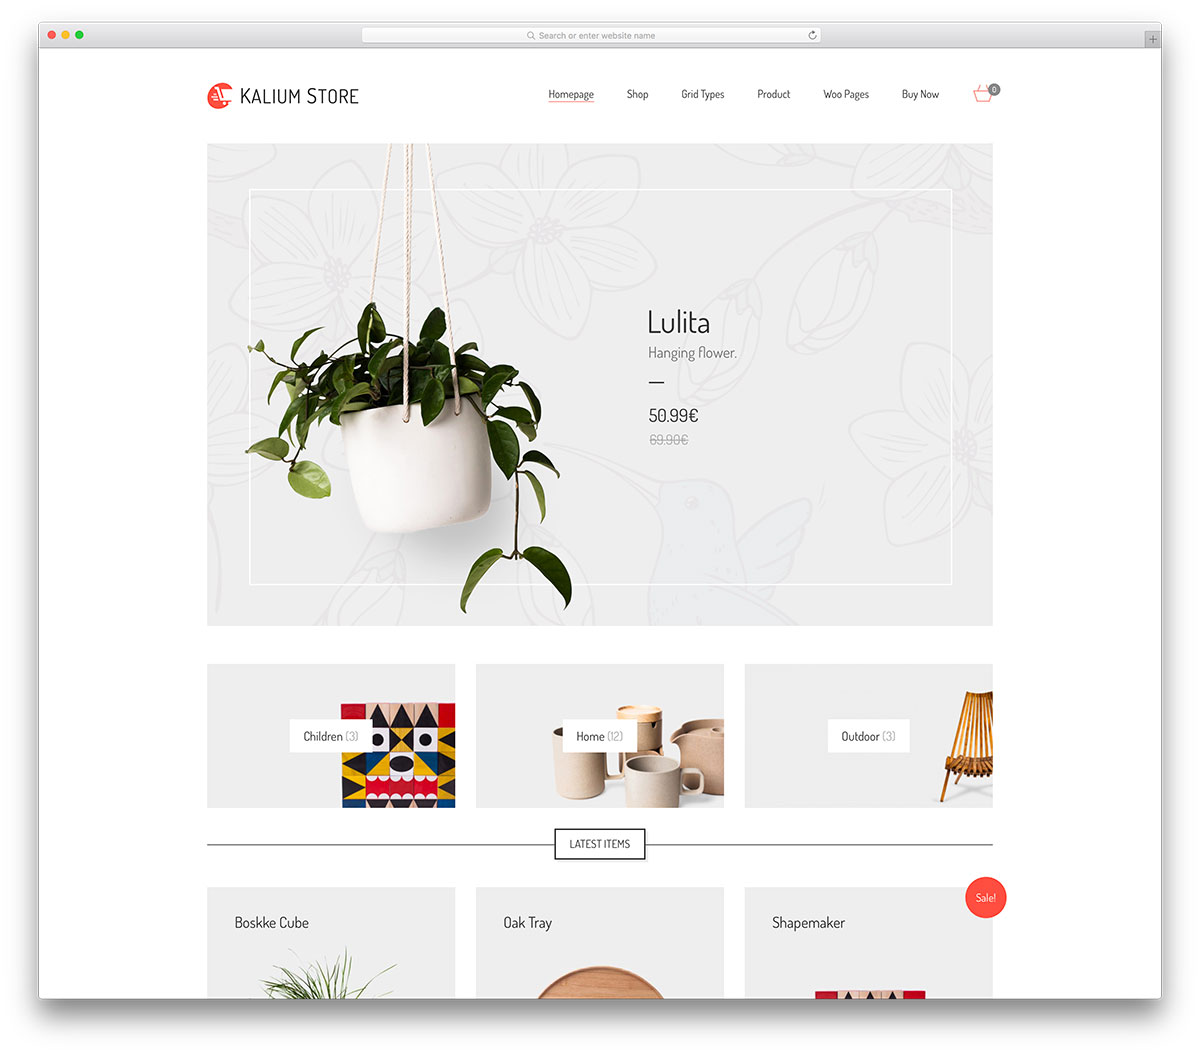 kalium-simple-ecommerce-website-template